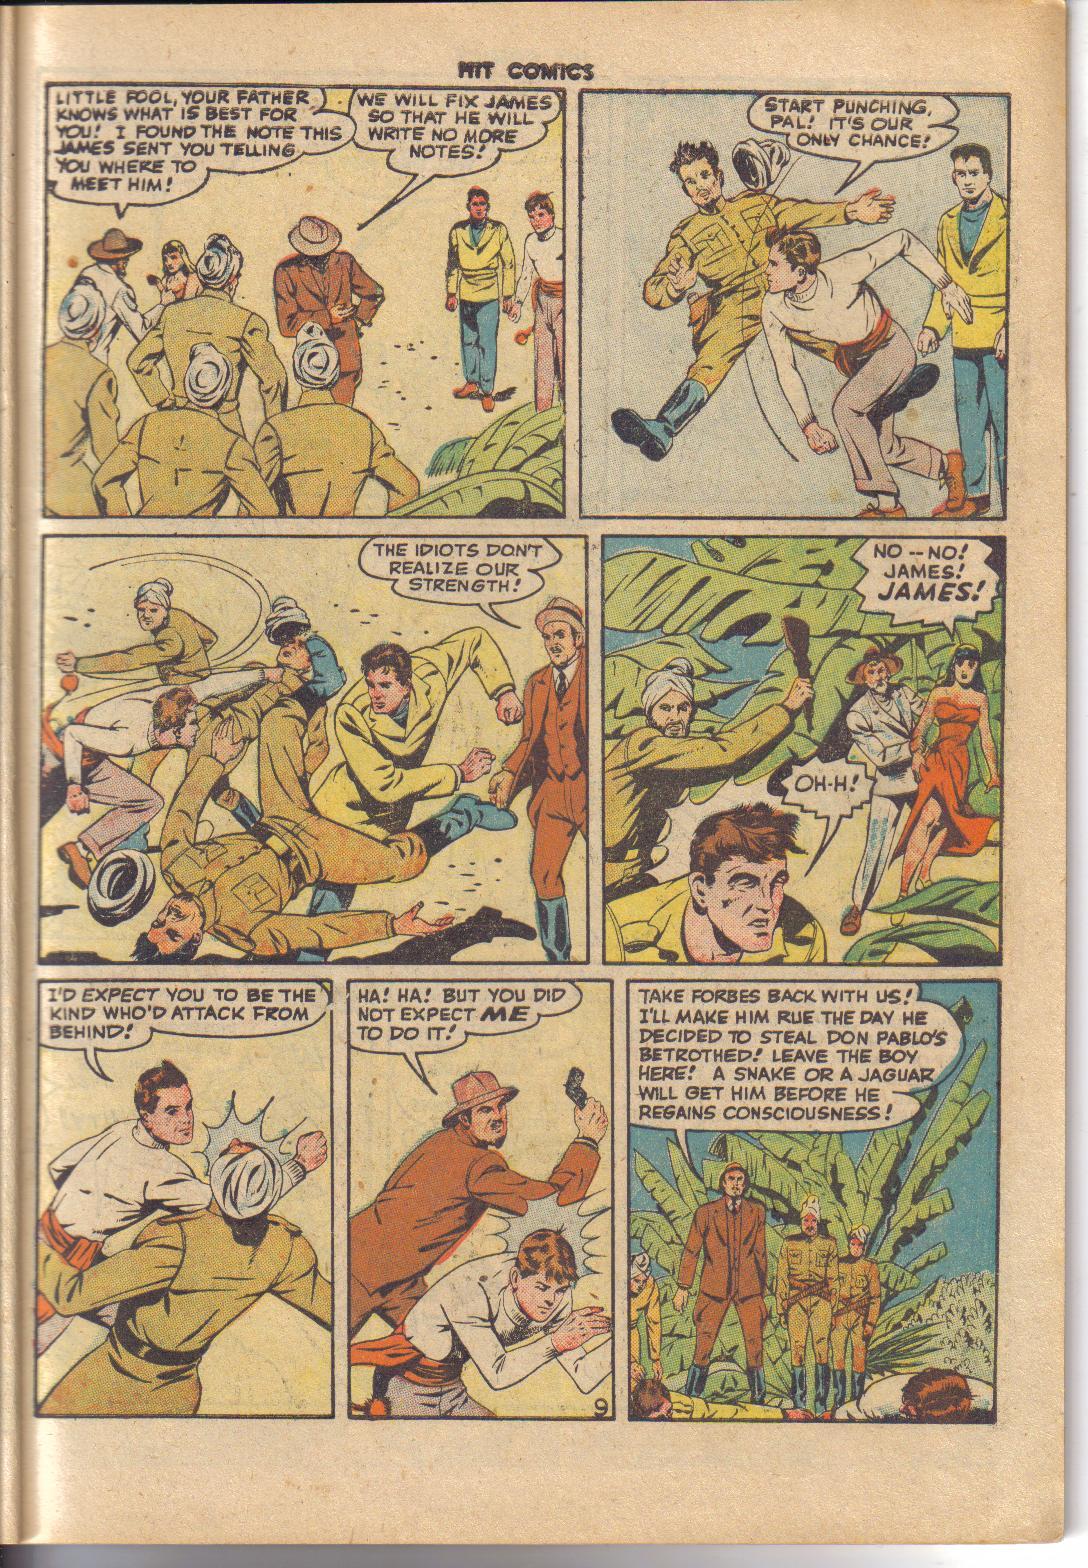 Read online Hit Comics comic -  Issue #45 - 11